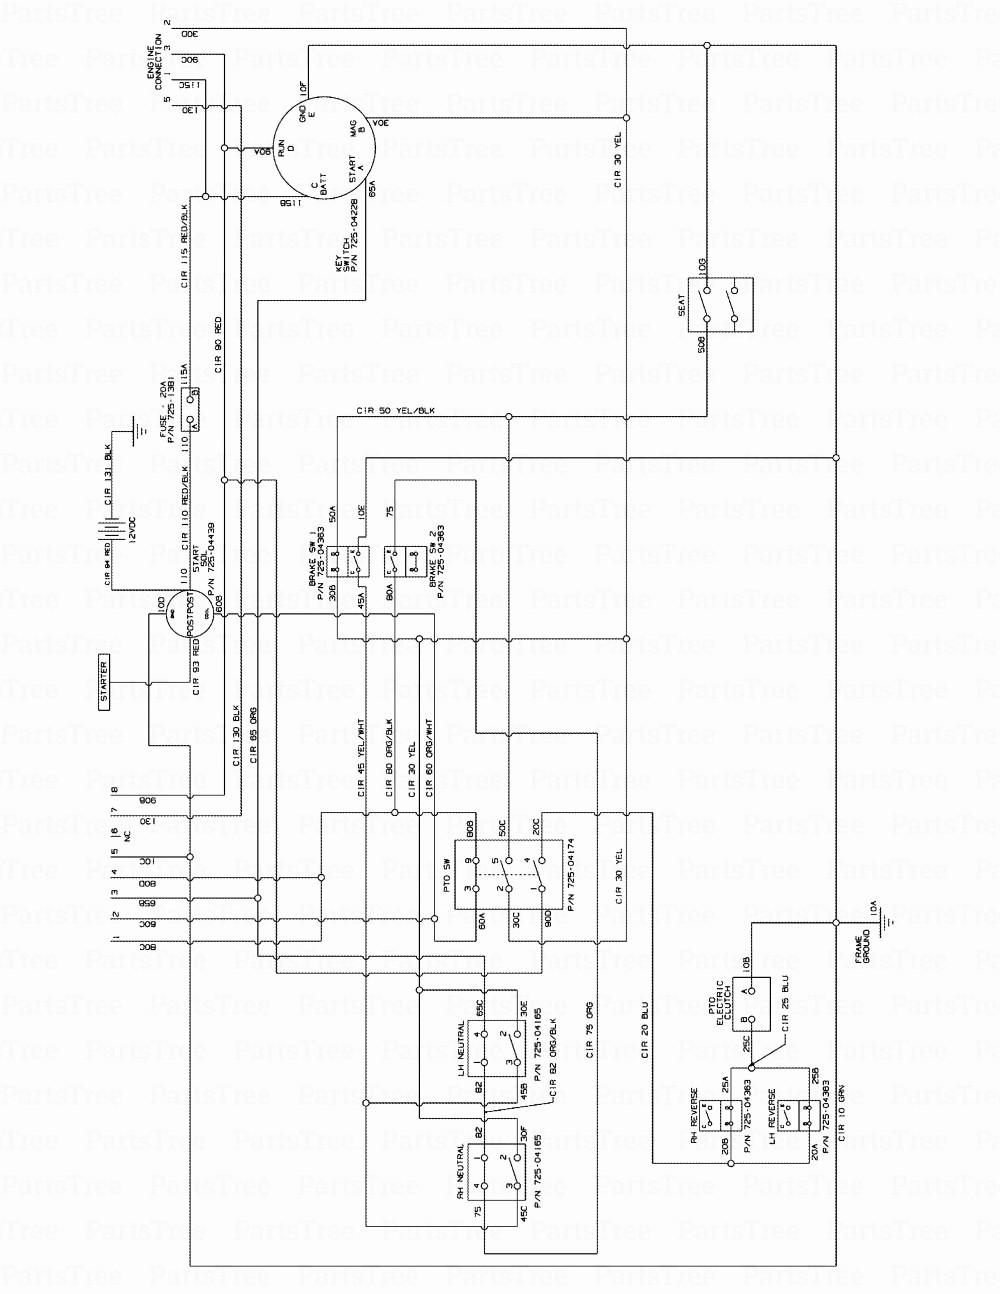 medium resolution of cub cadet w600 wiring diagram wiring library cub cadet w600 wiring diagram